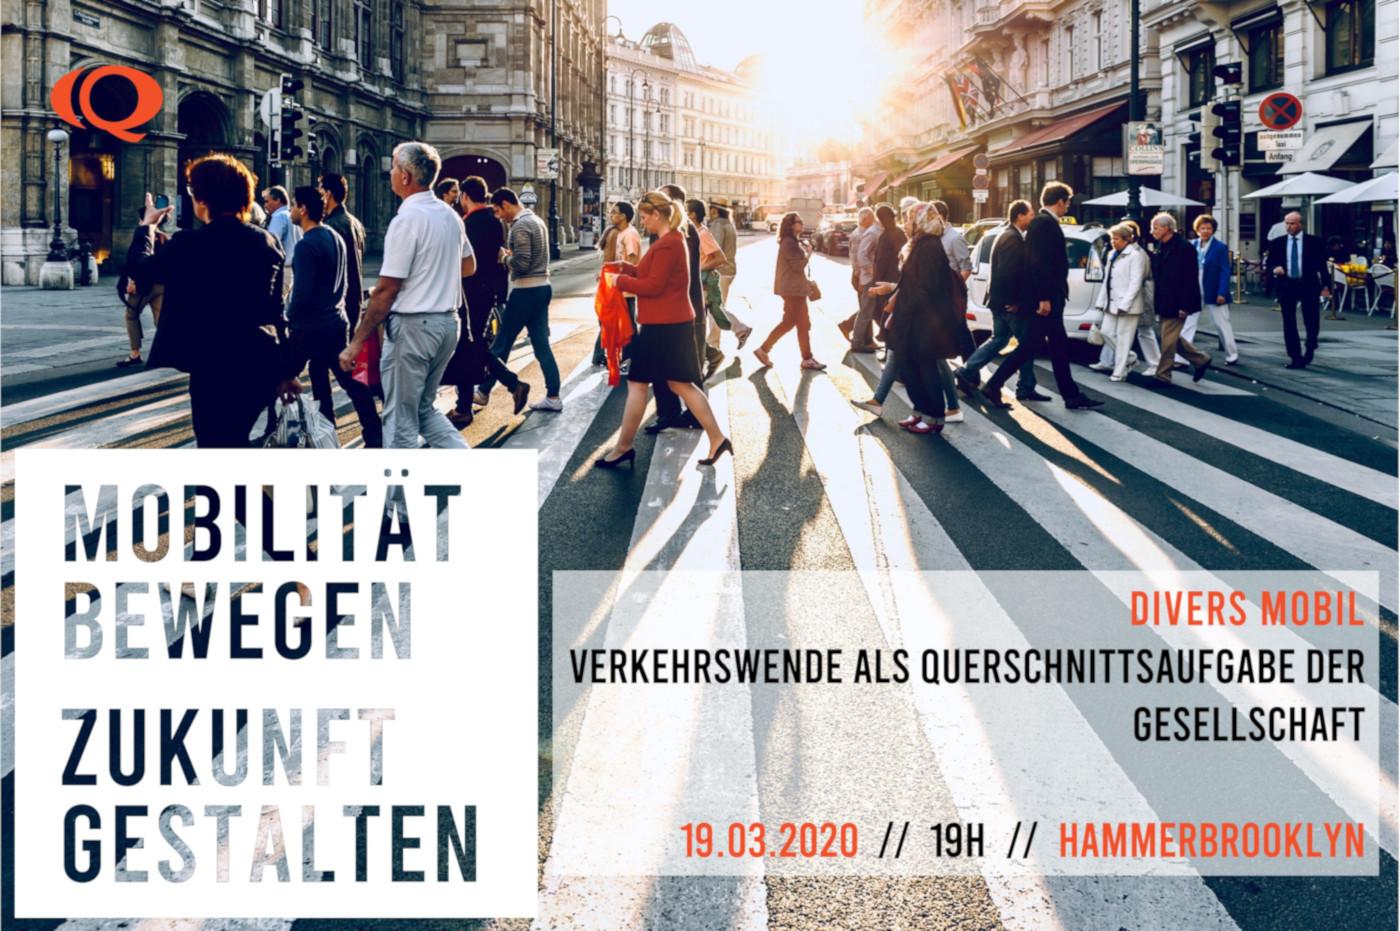 "Meetup""Mobilität bewegen – Zukunft gestalten"" @ Digital Campus Hammerbrooklyn"